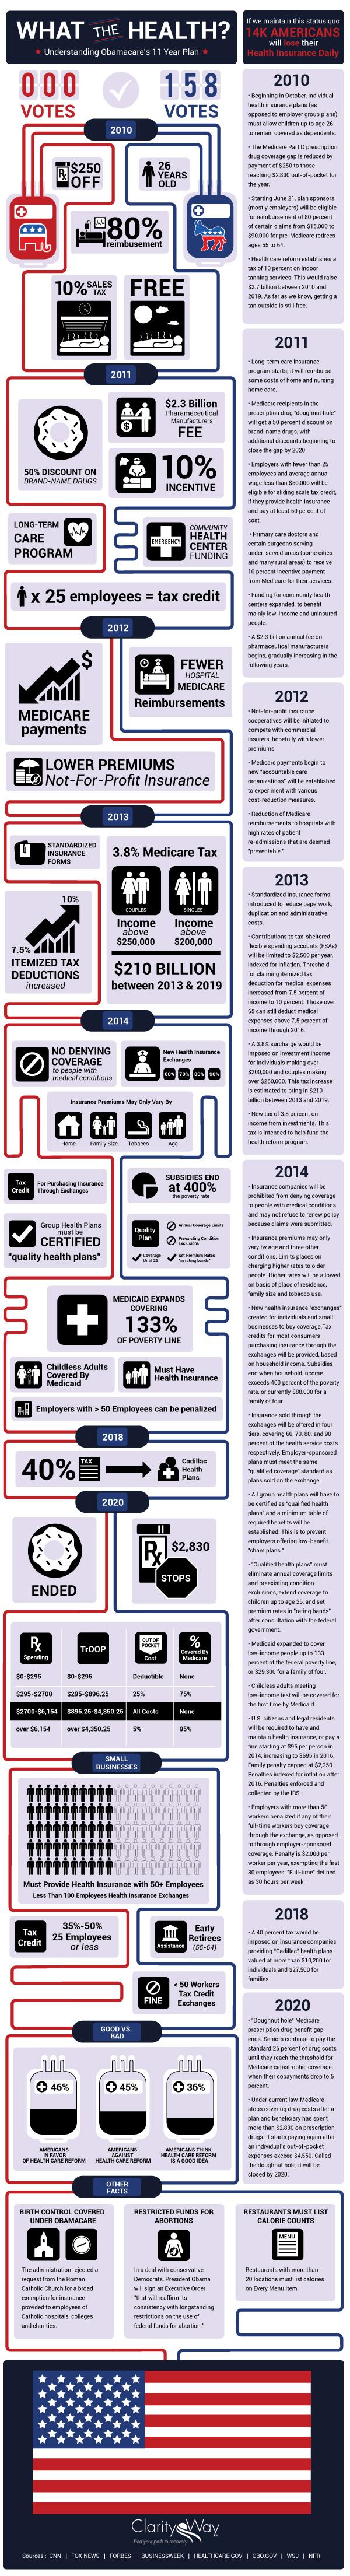 obamacare-timeline-infographic